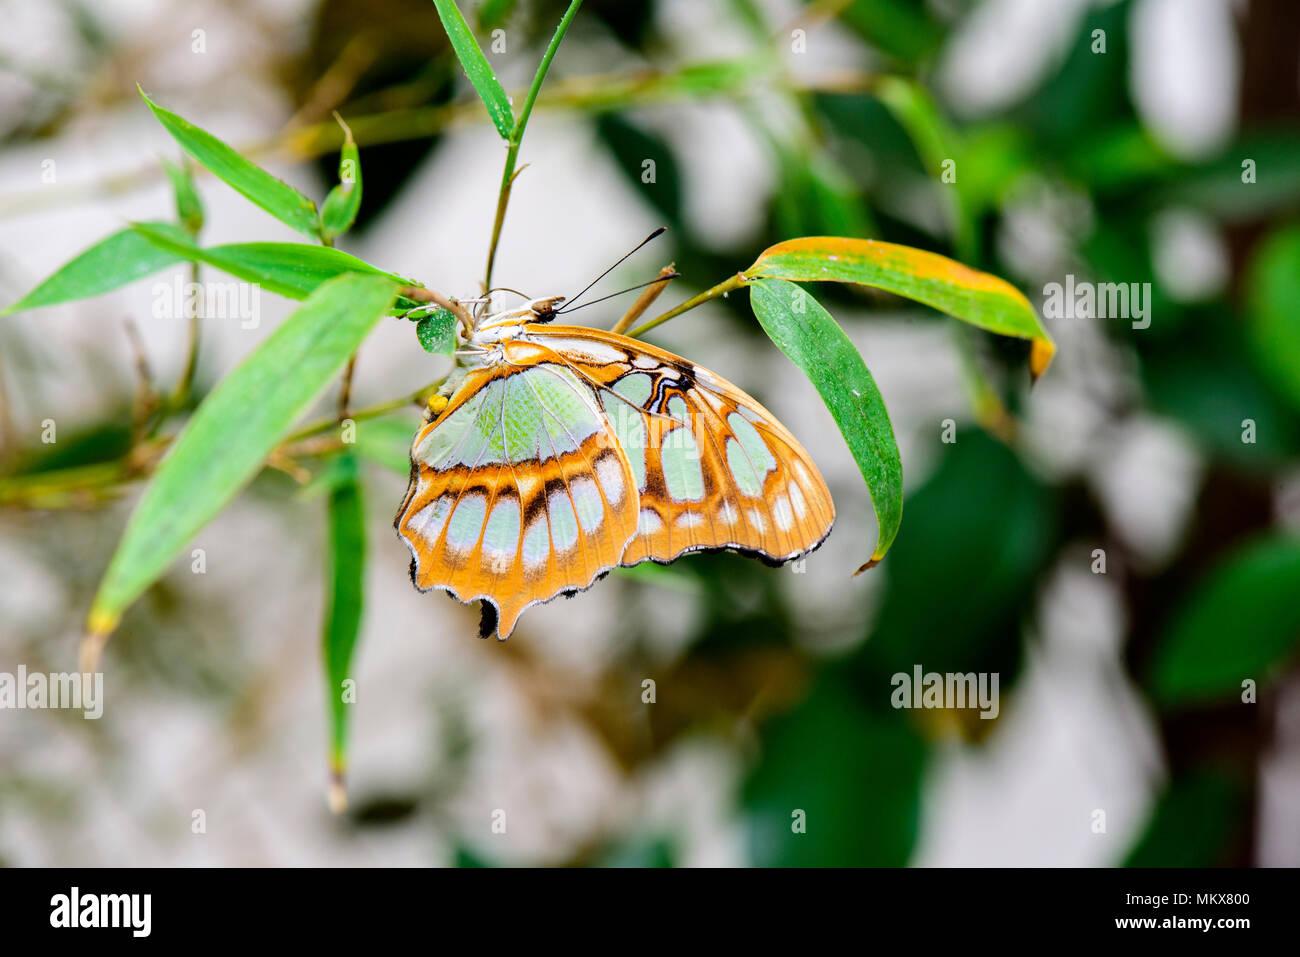 Malachite butterlfy (Siproeta Stelenes) on leaf - Stock Image